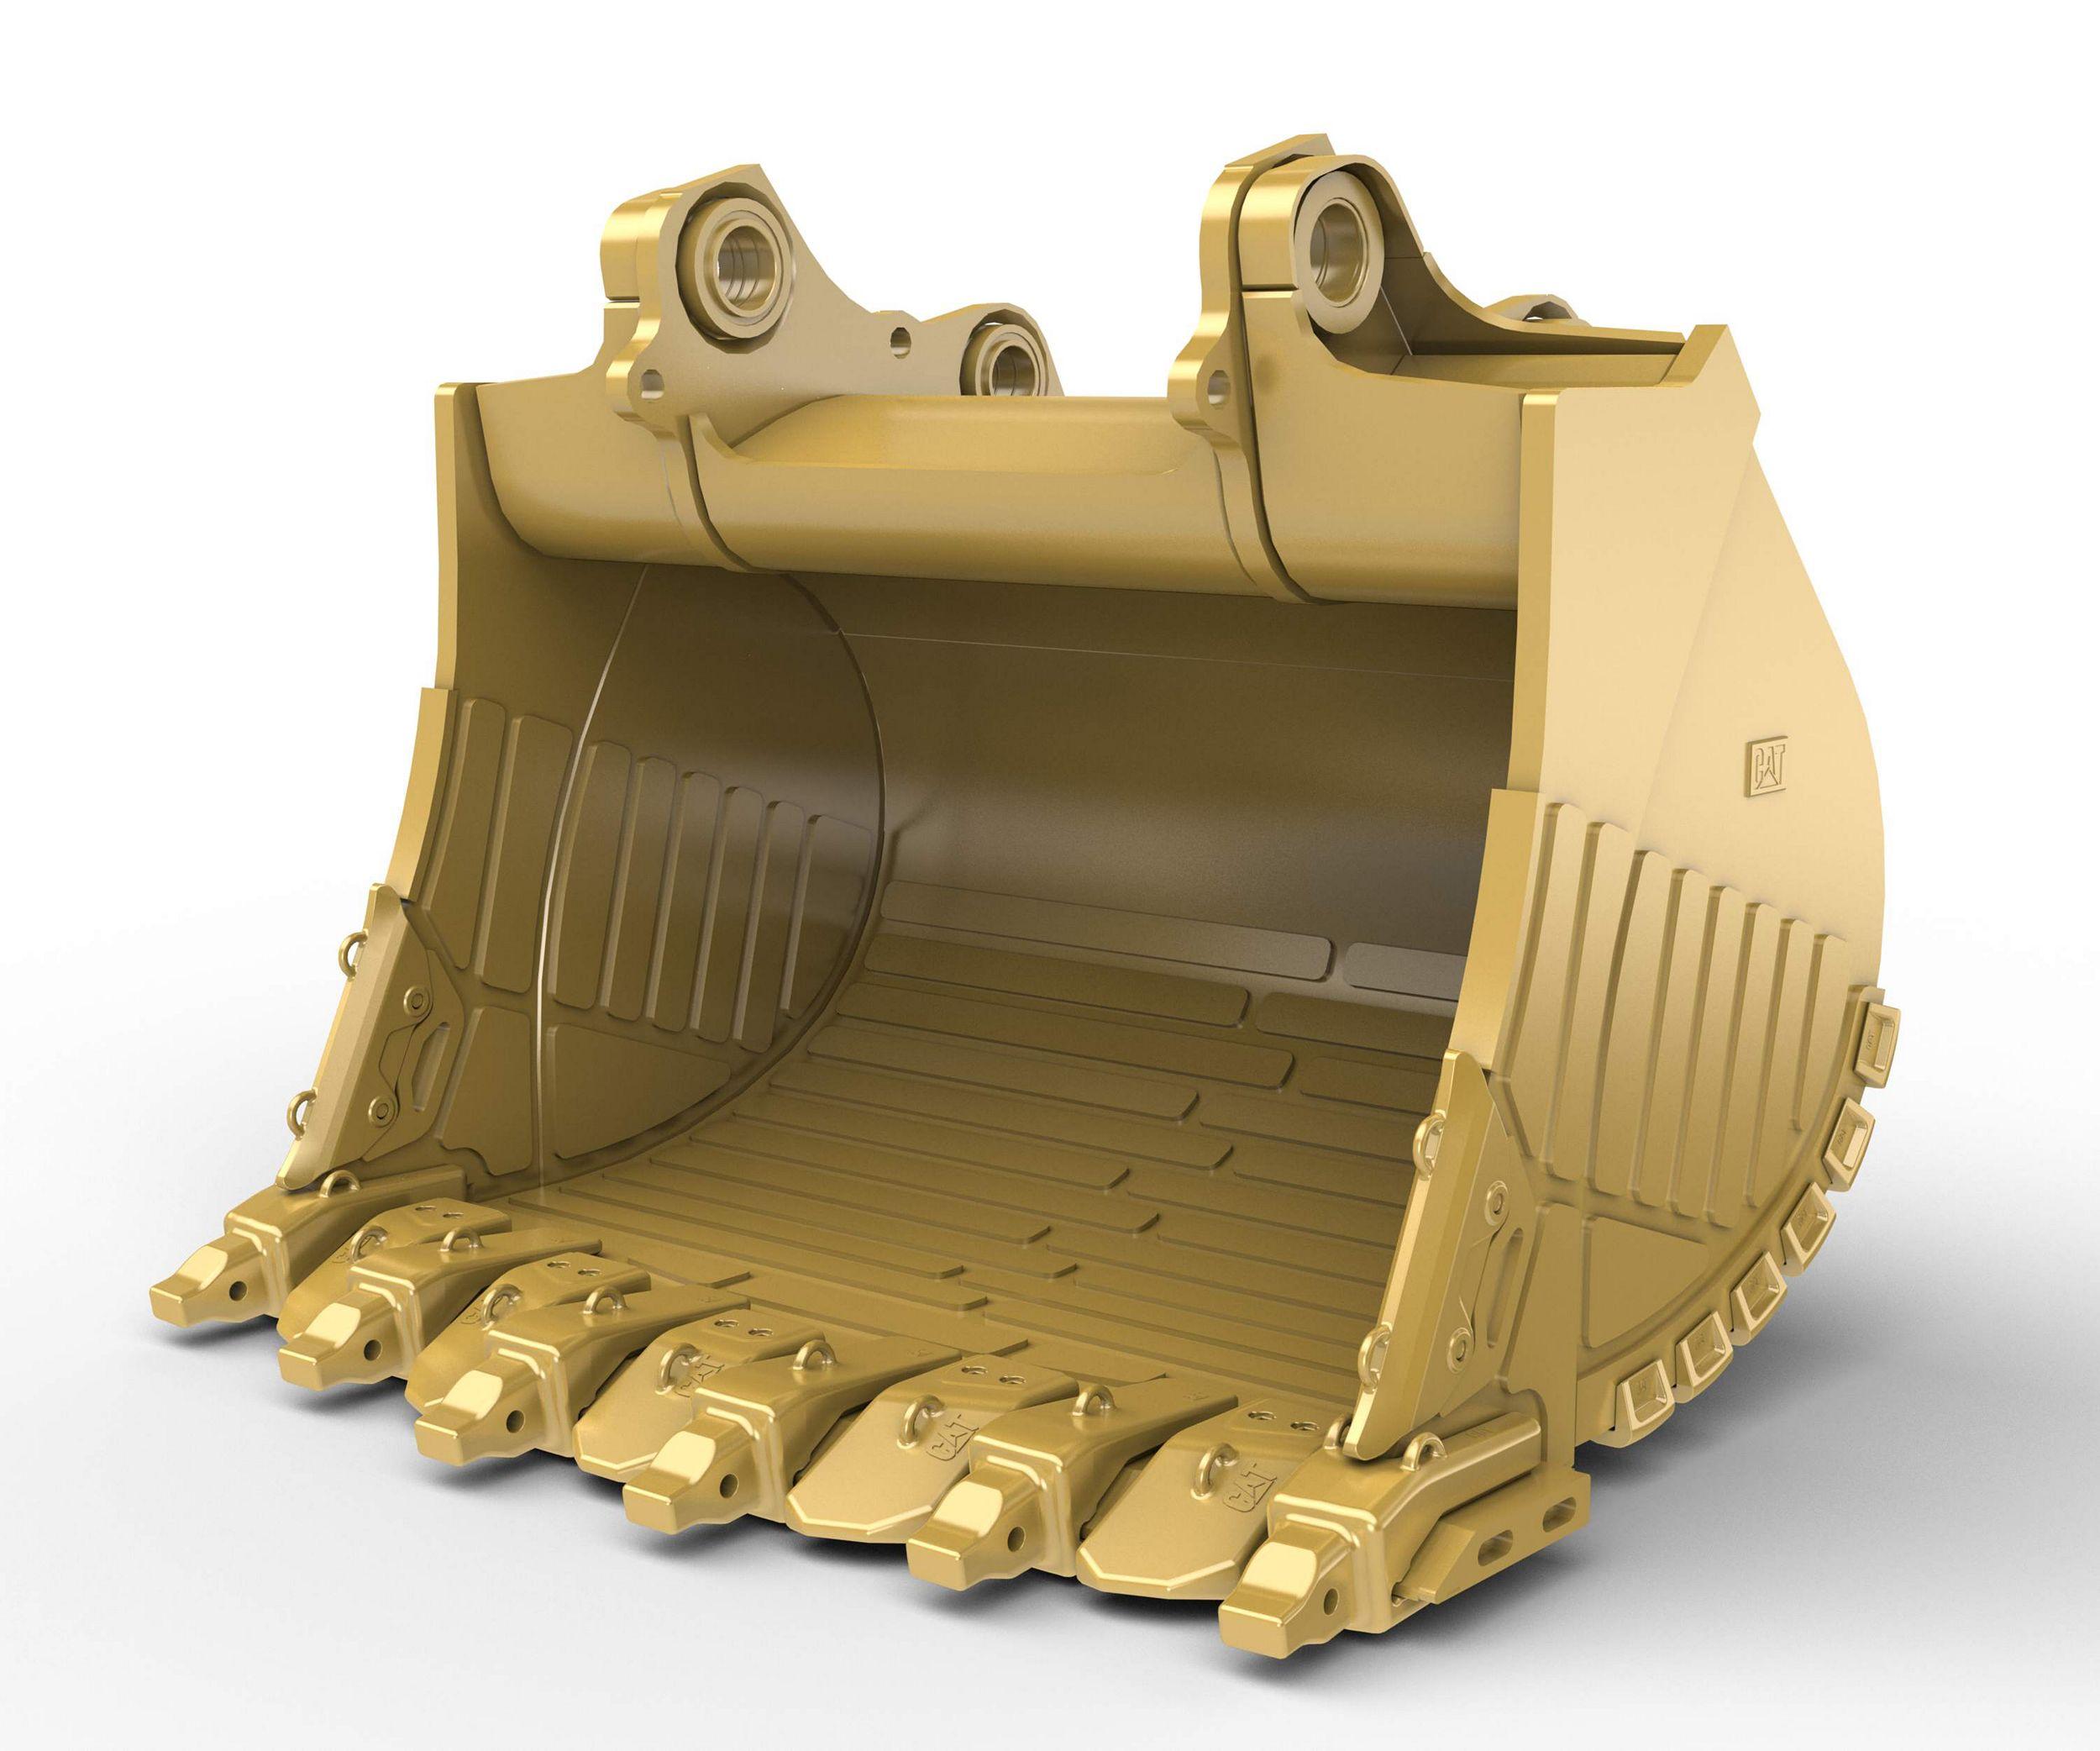 7m³ (9.2yd³) Standard Rock bucket for the 6020B Hyd Mining Shovel